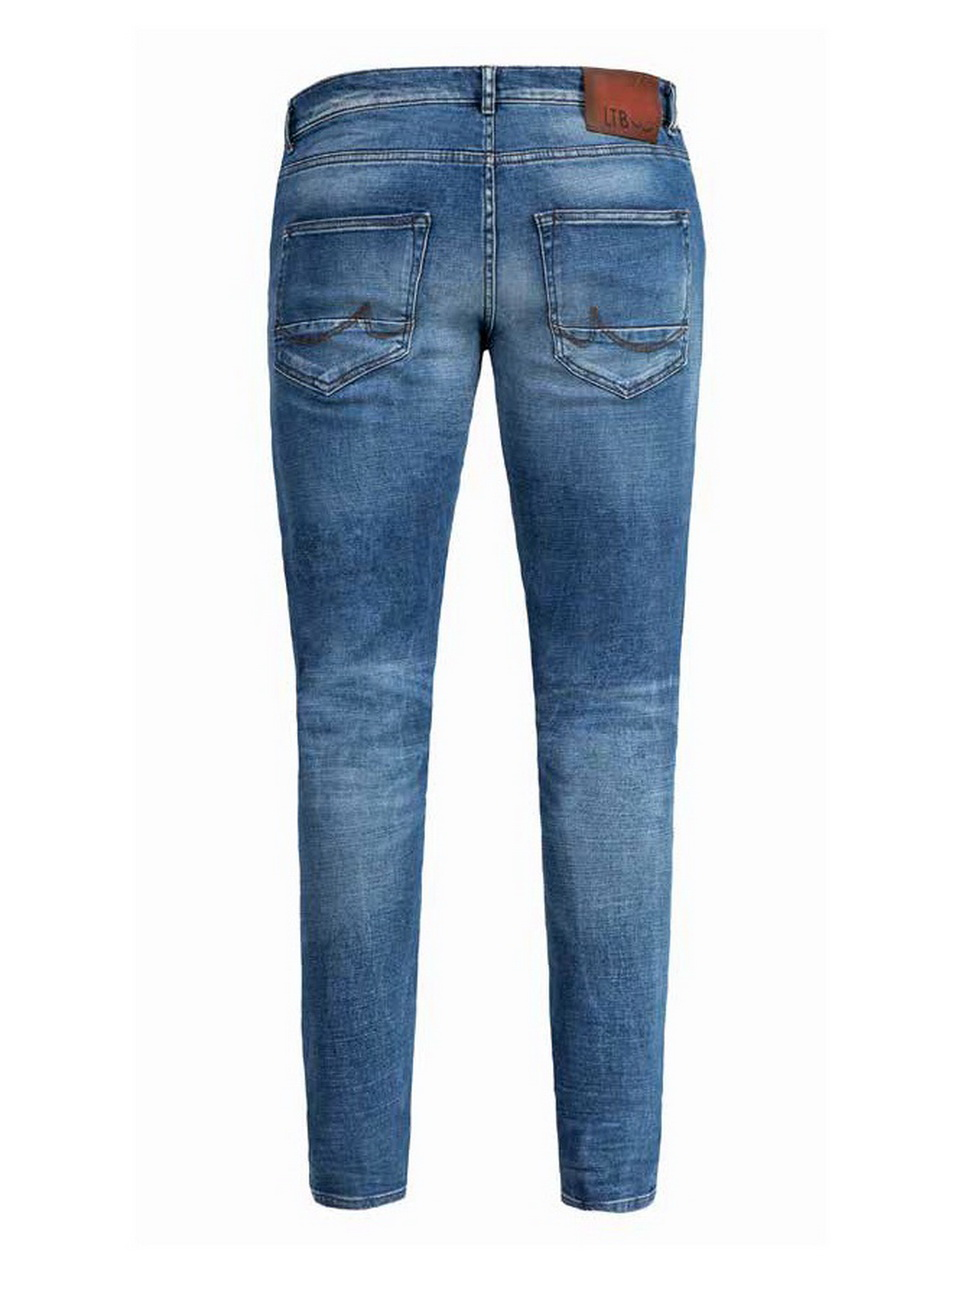 ltb-herren-jeans-smarty-super-skinny-fit-blau-batur-wash